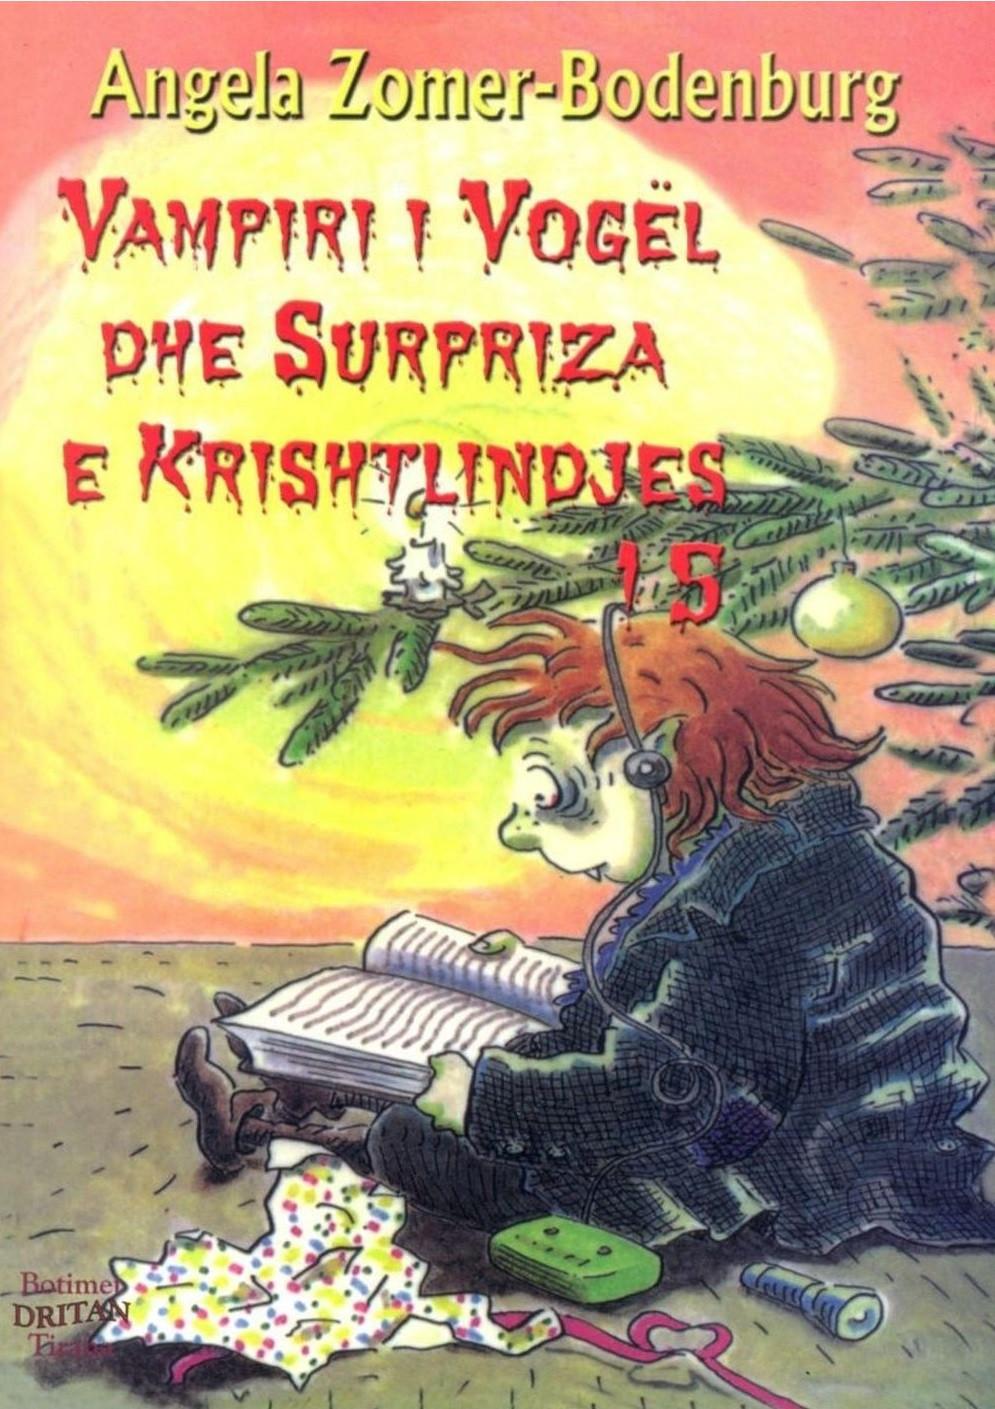 Vampiri i vogel 15 surpriza e Krishtlindjes